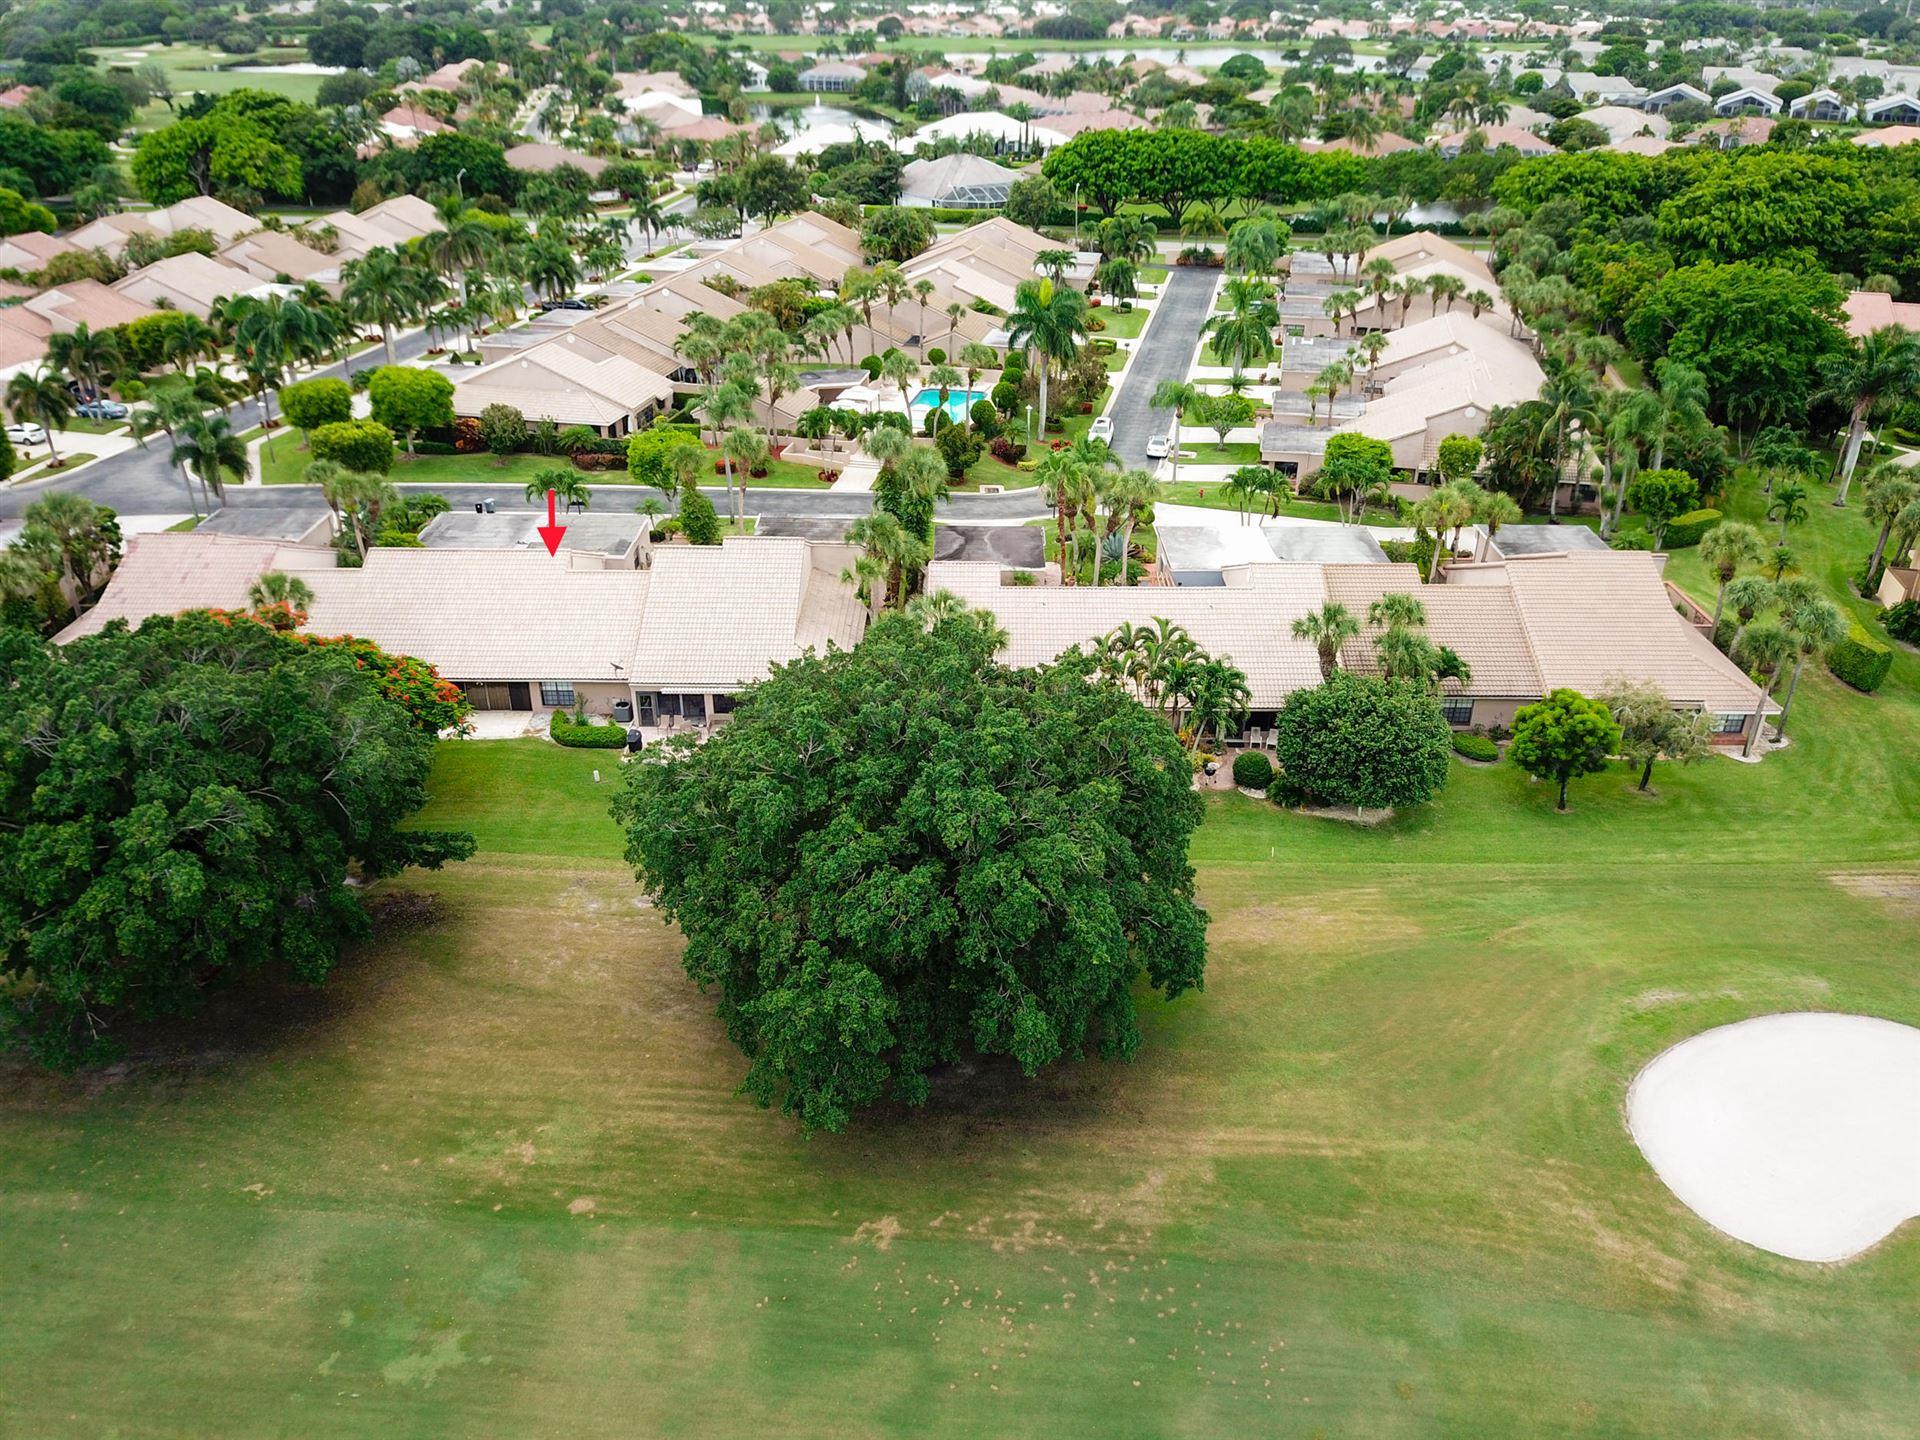 11158 Applegate Circle, Boynton Beach, FL 33437 - #: RX-10639871